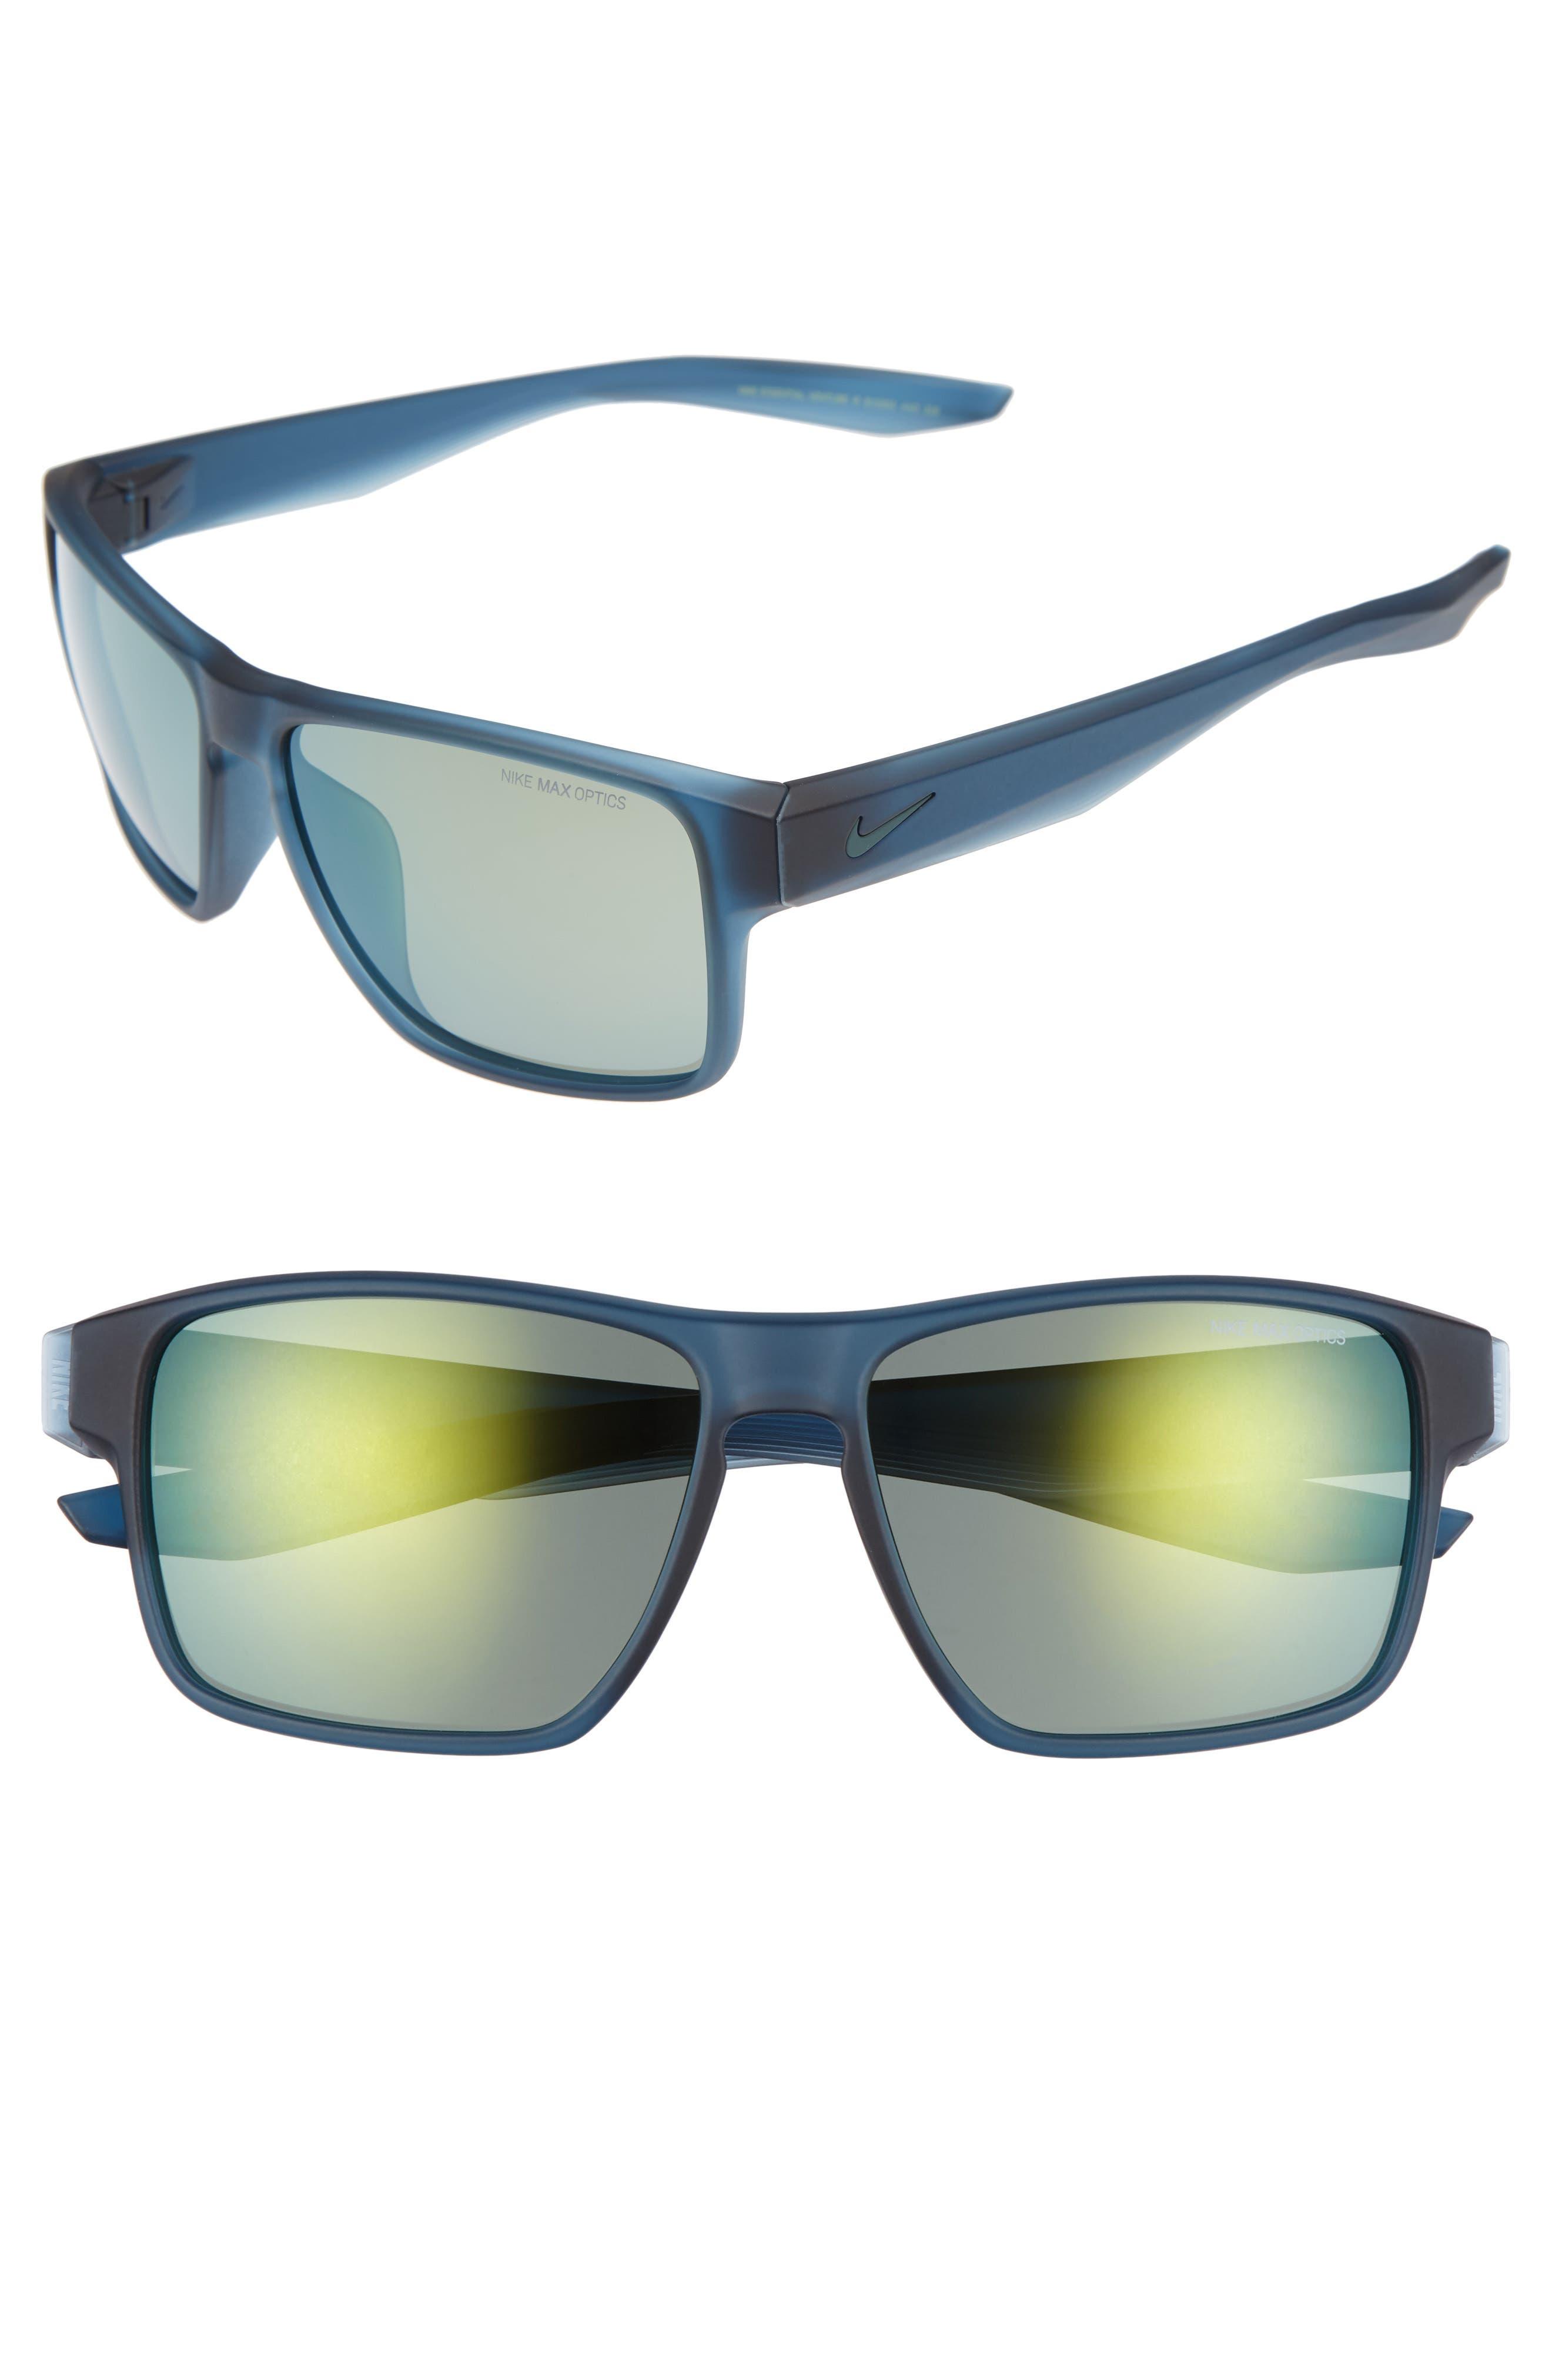 Main Image - Nike Essential Venture R 59mm Sunglasses